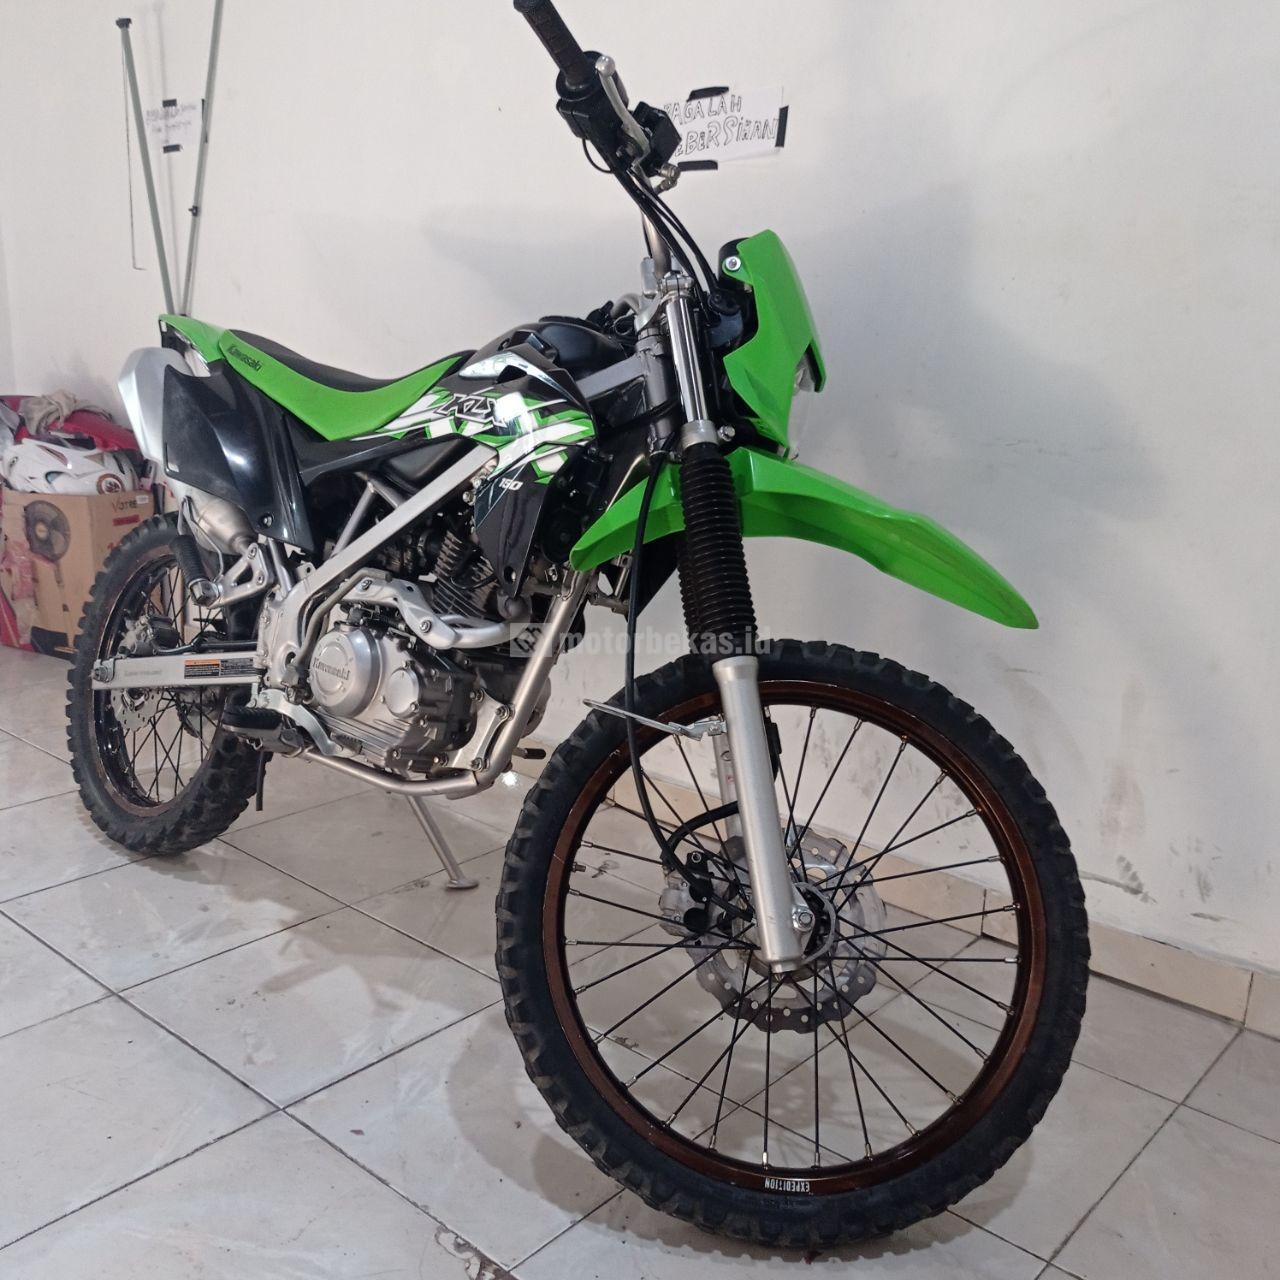 KAWASAKI KLX 150  624 motorbekas.id